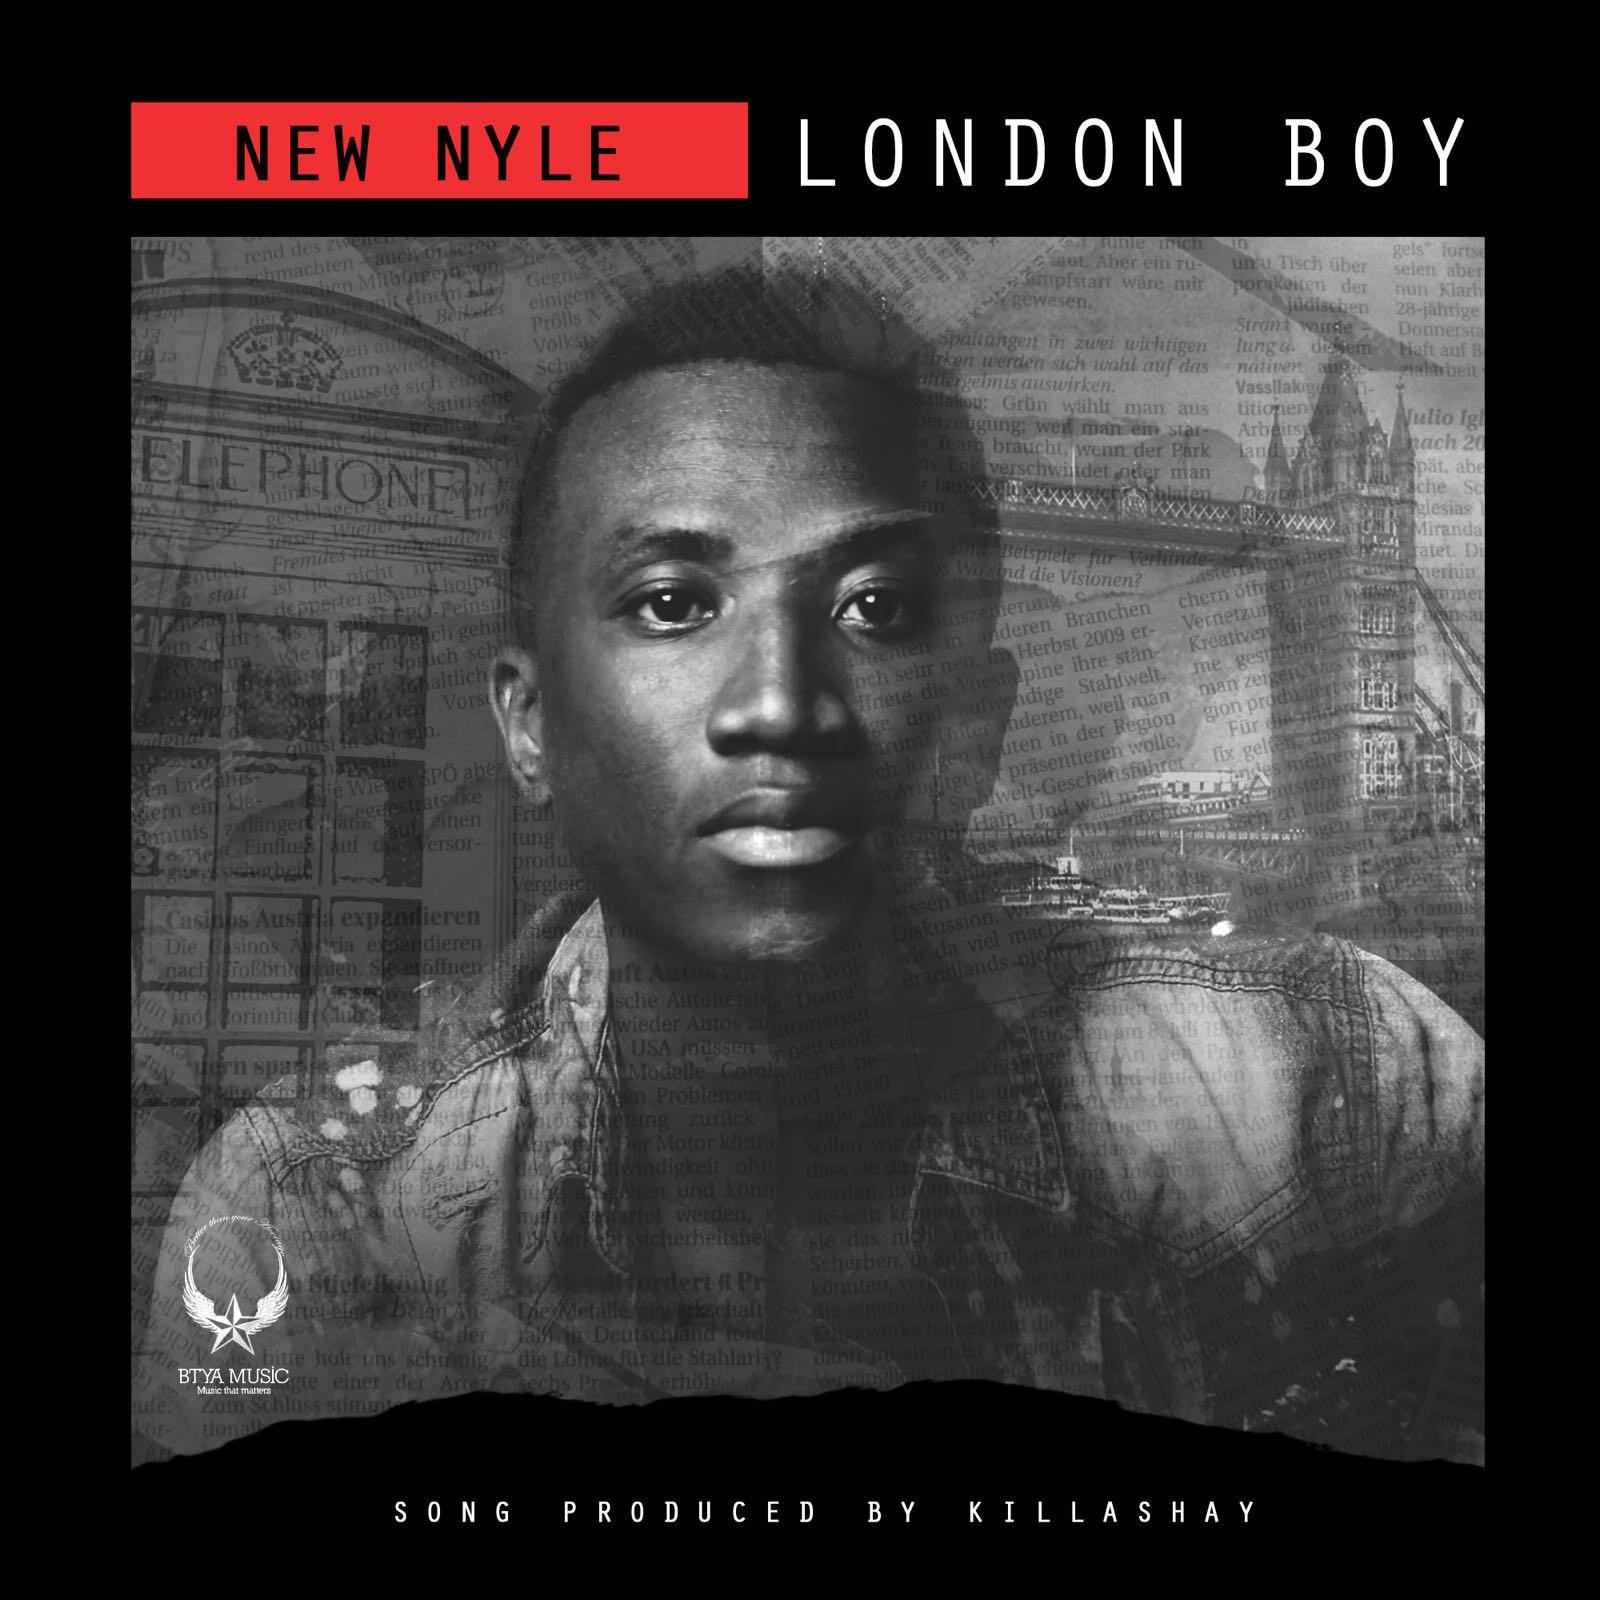 VIDEO: New Nyle – London Boy Rfx